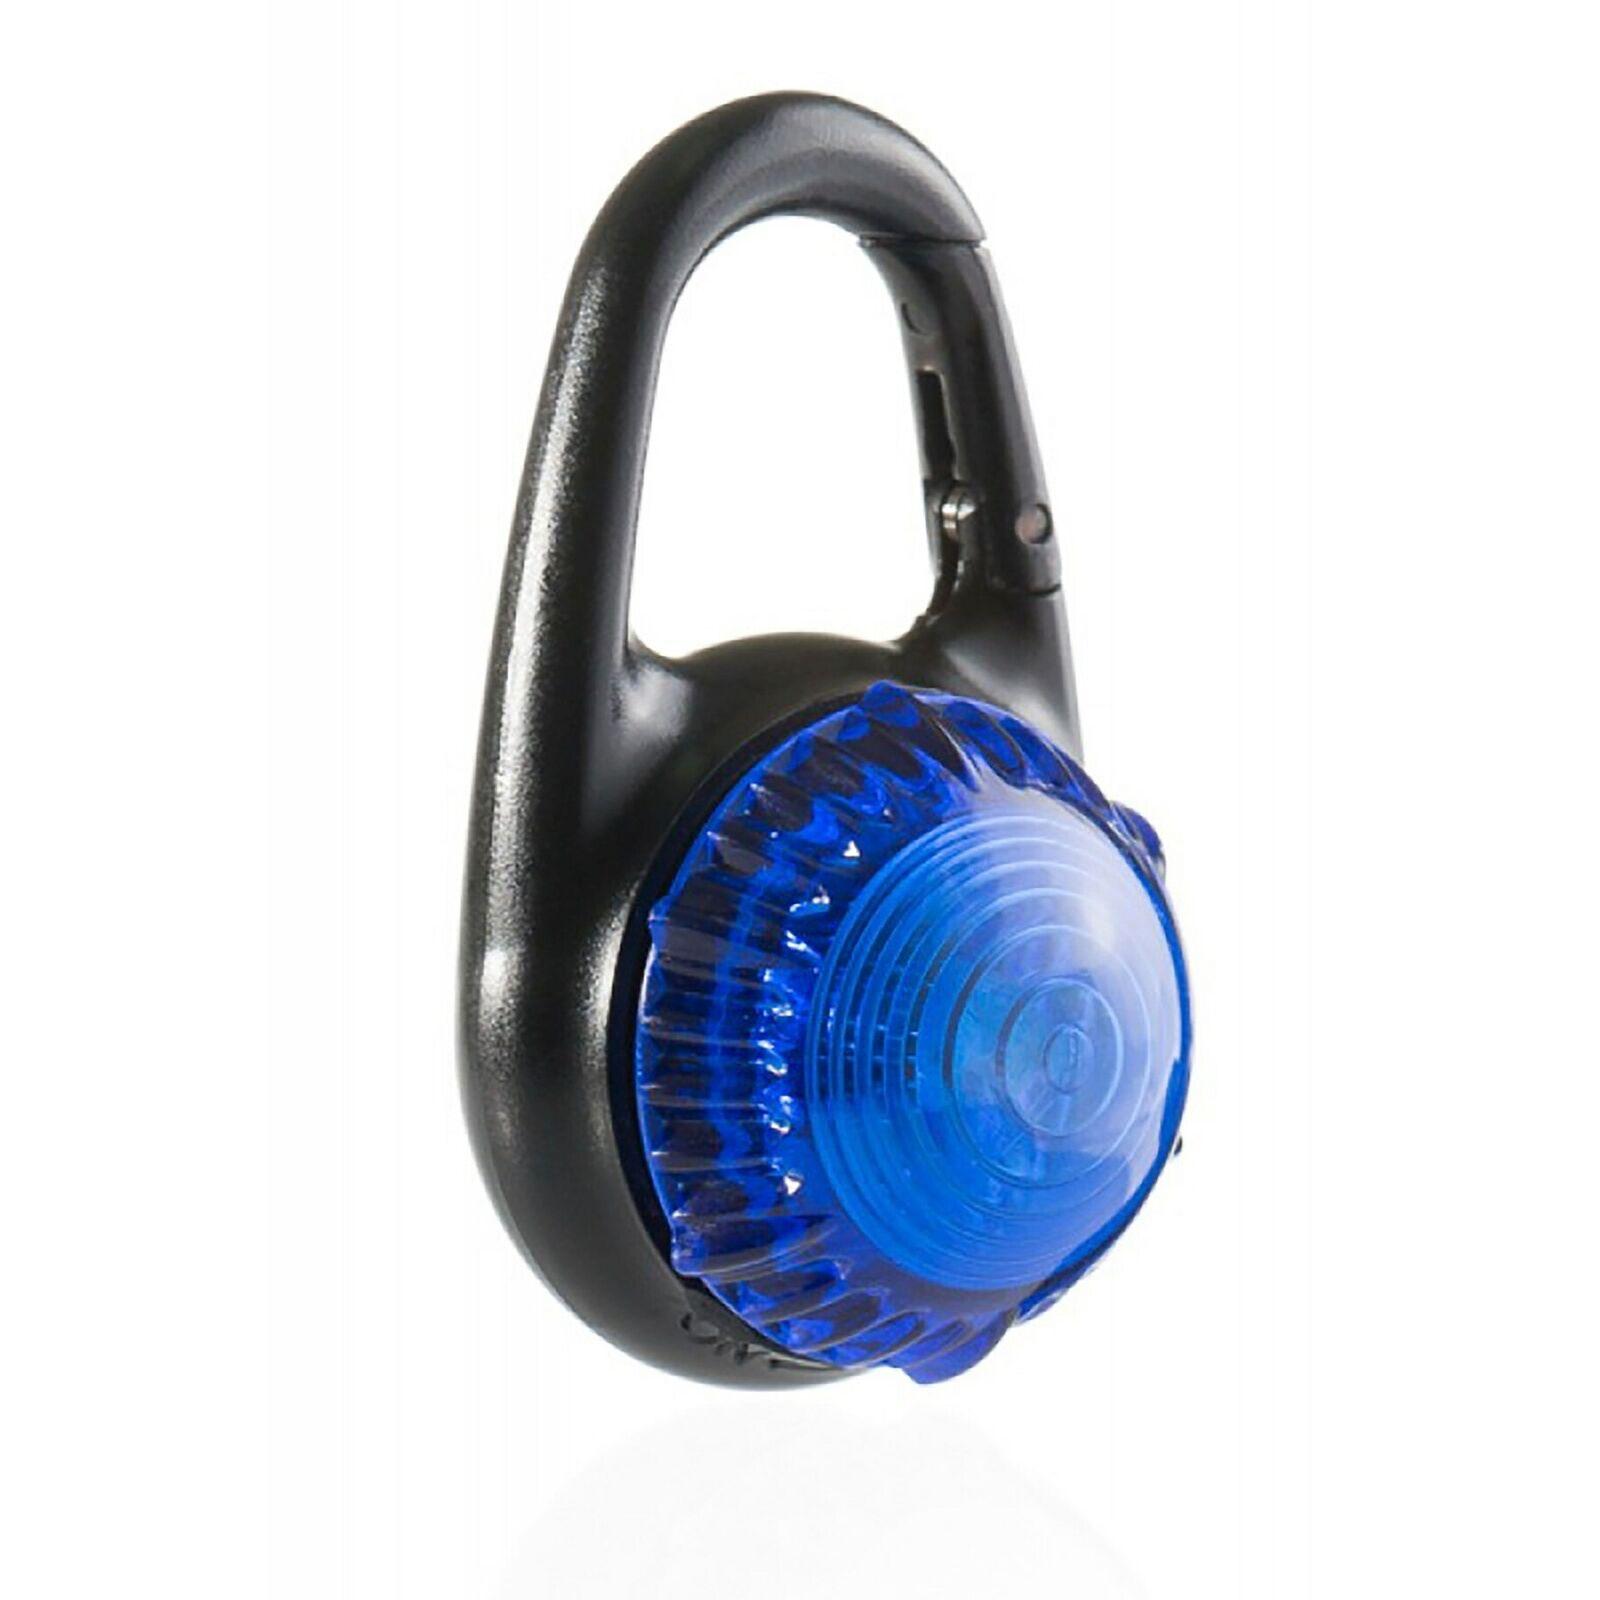 Luces de aventura Guardian  Tag-Mosquetón Azul Luz de Seguridad (6 paquetes)  conveniente